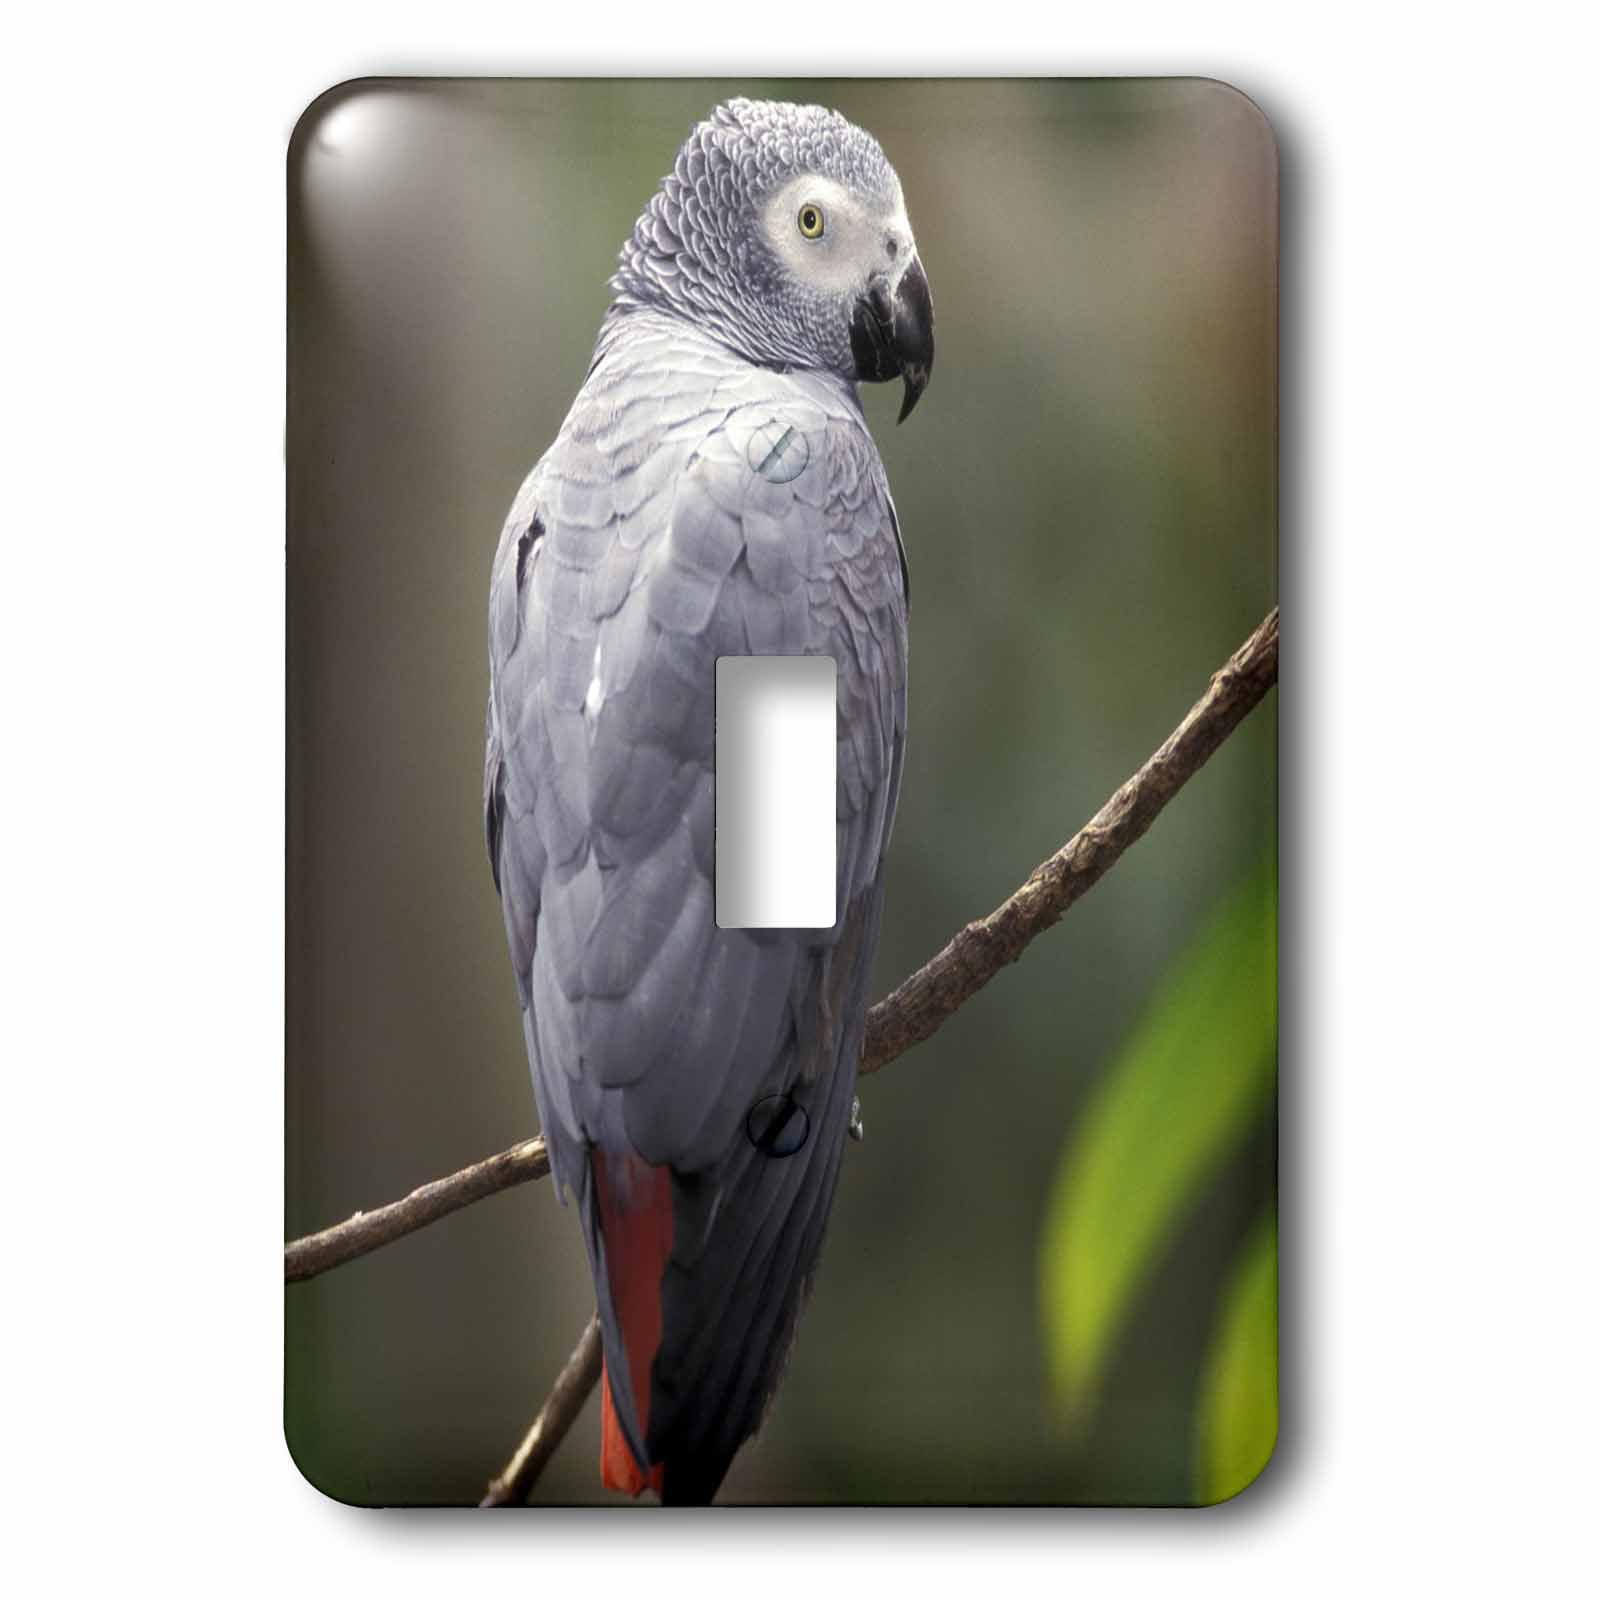 3dRose African Gray Parrot, Tropical Bird - NA02 AJE0248 - Adam Jones, 2 Plug Outlet Cover